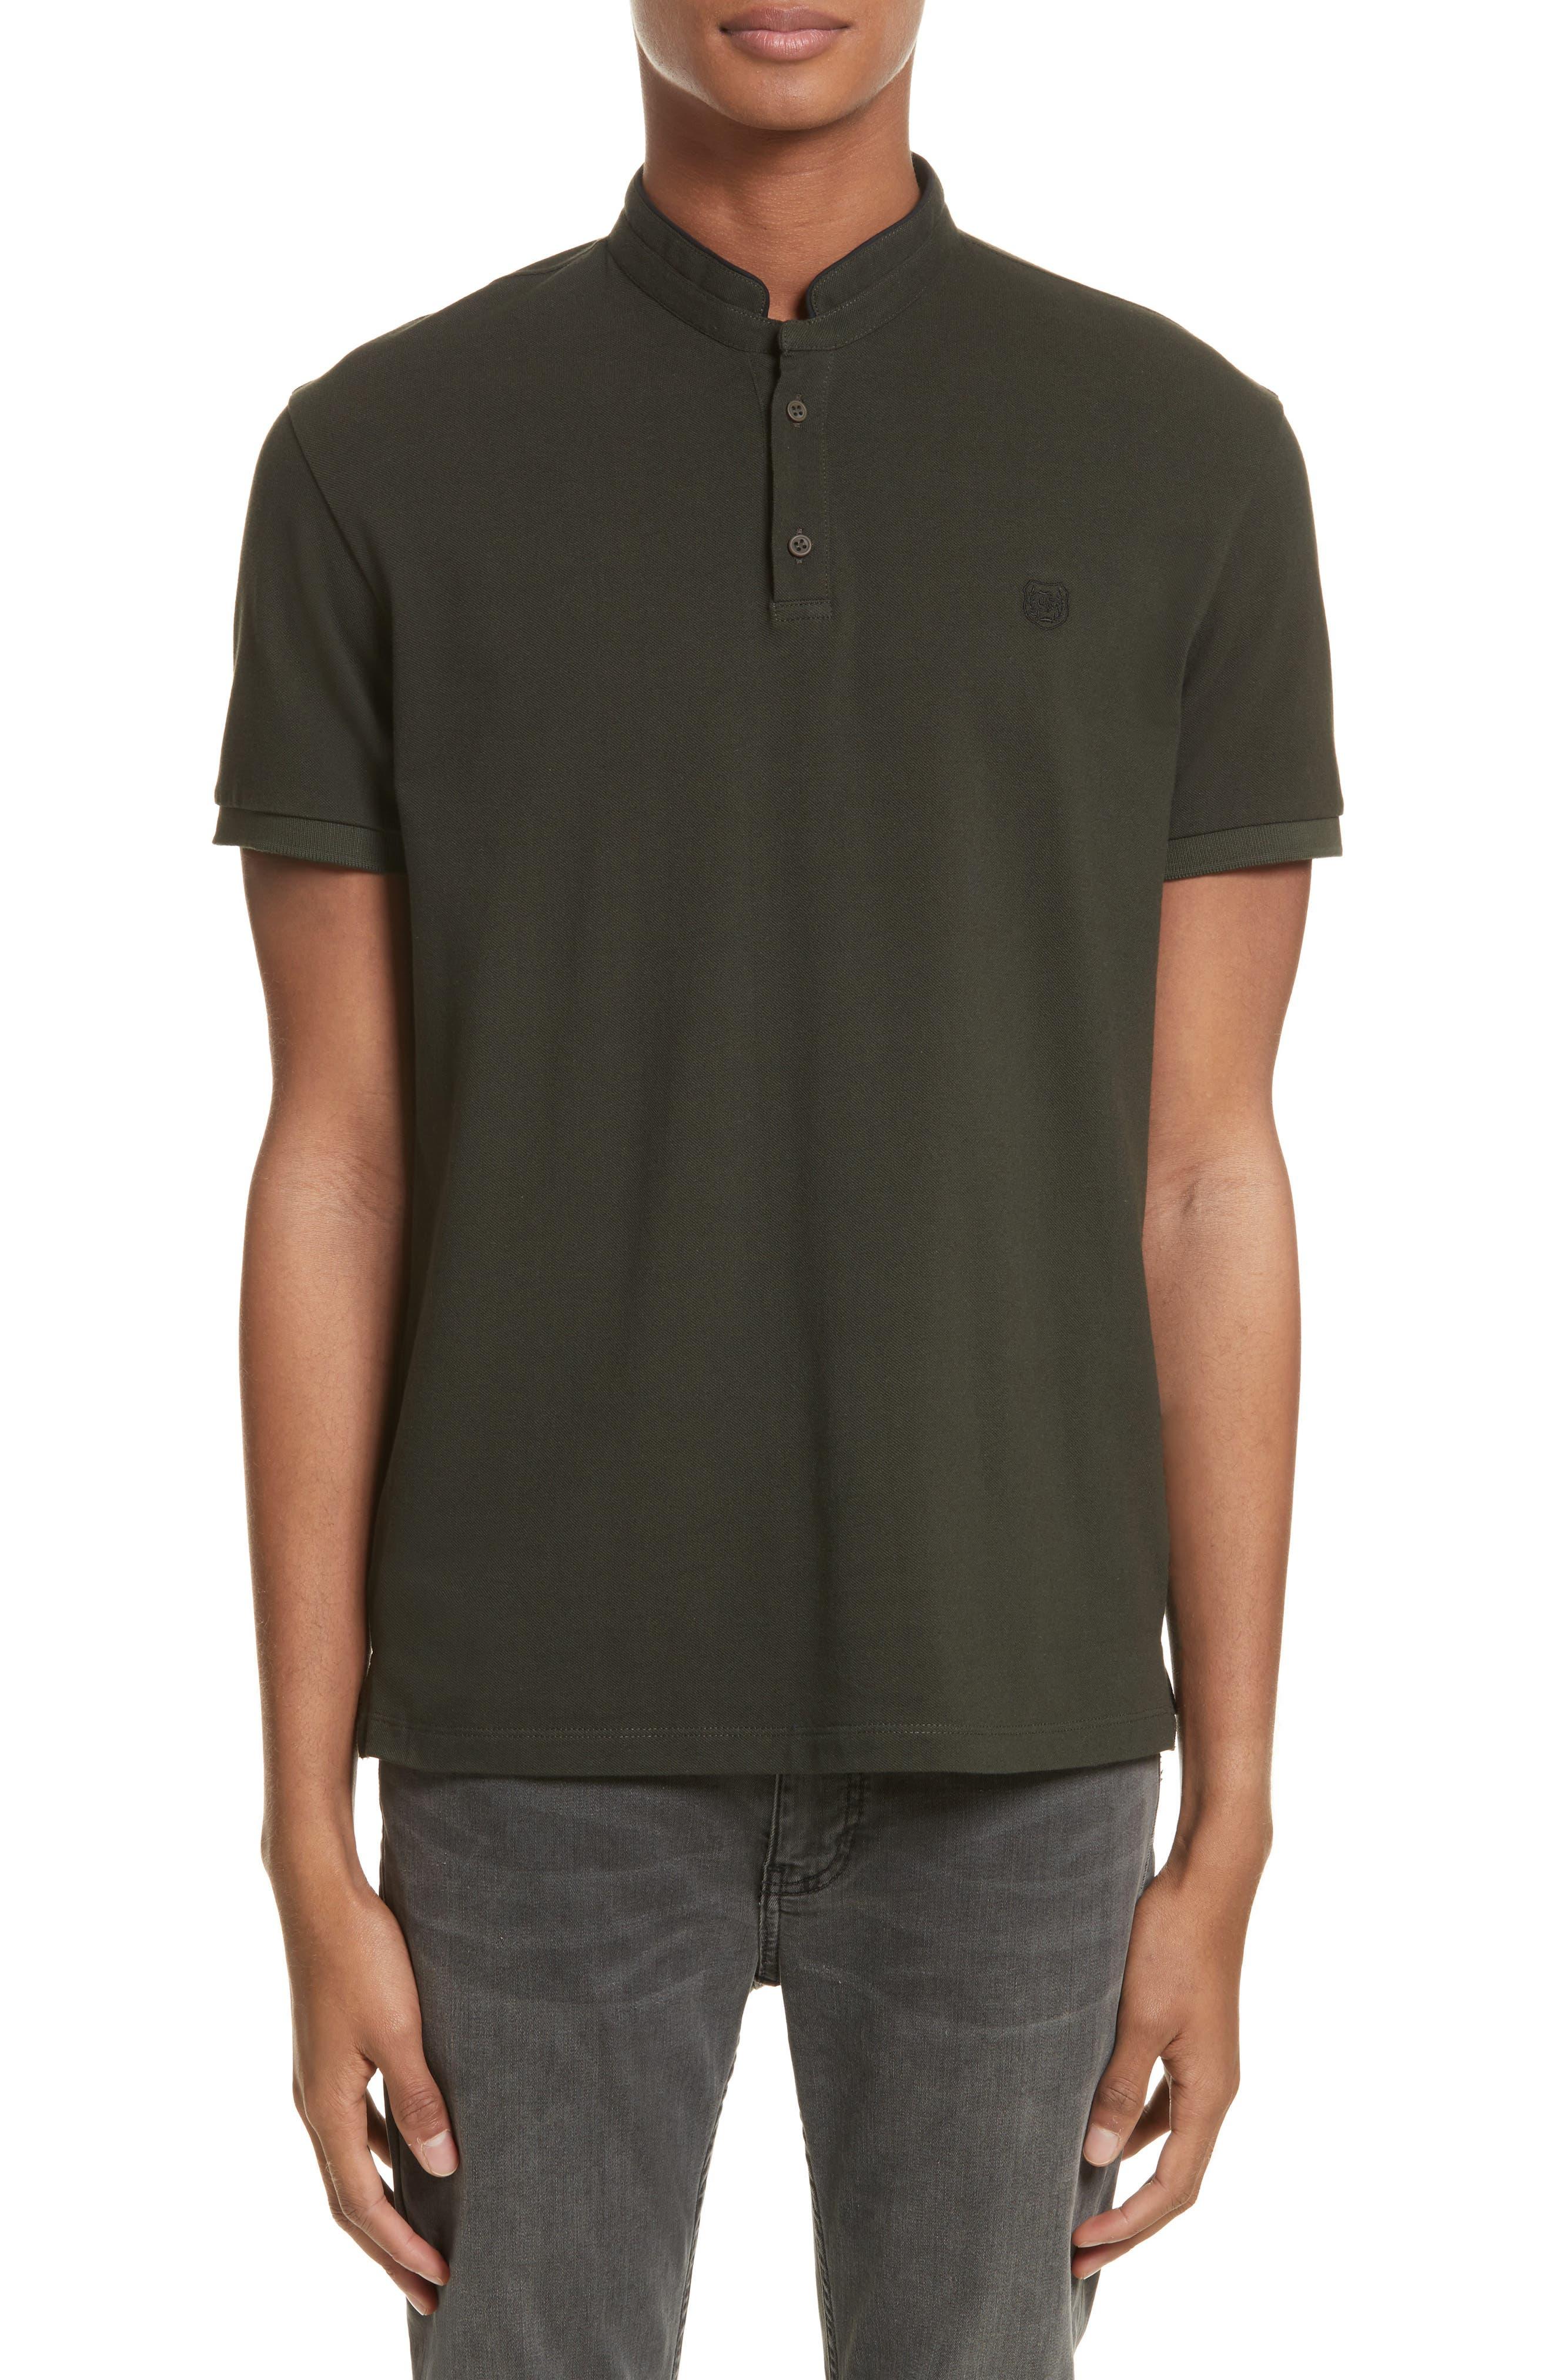 Officer Polo Shirt,                             Main thumbnail 1, color,                             311